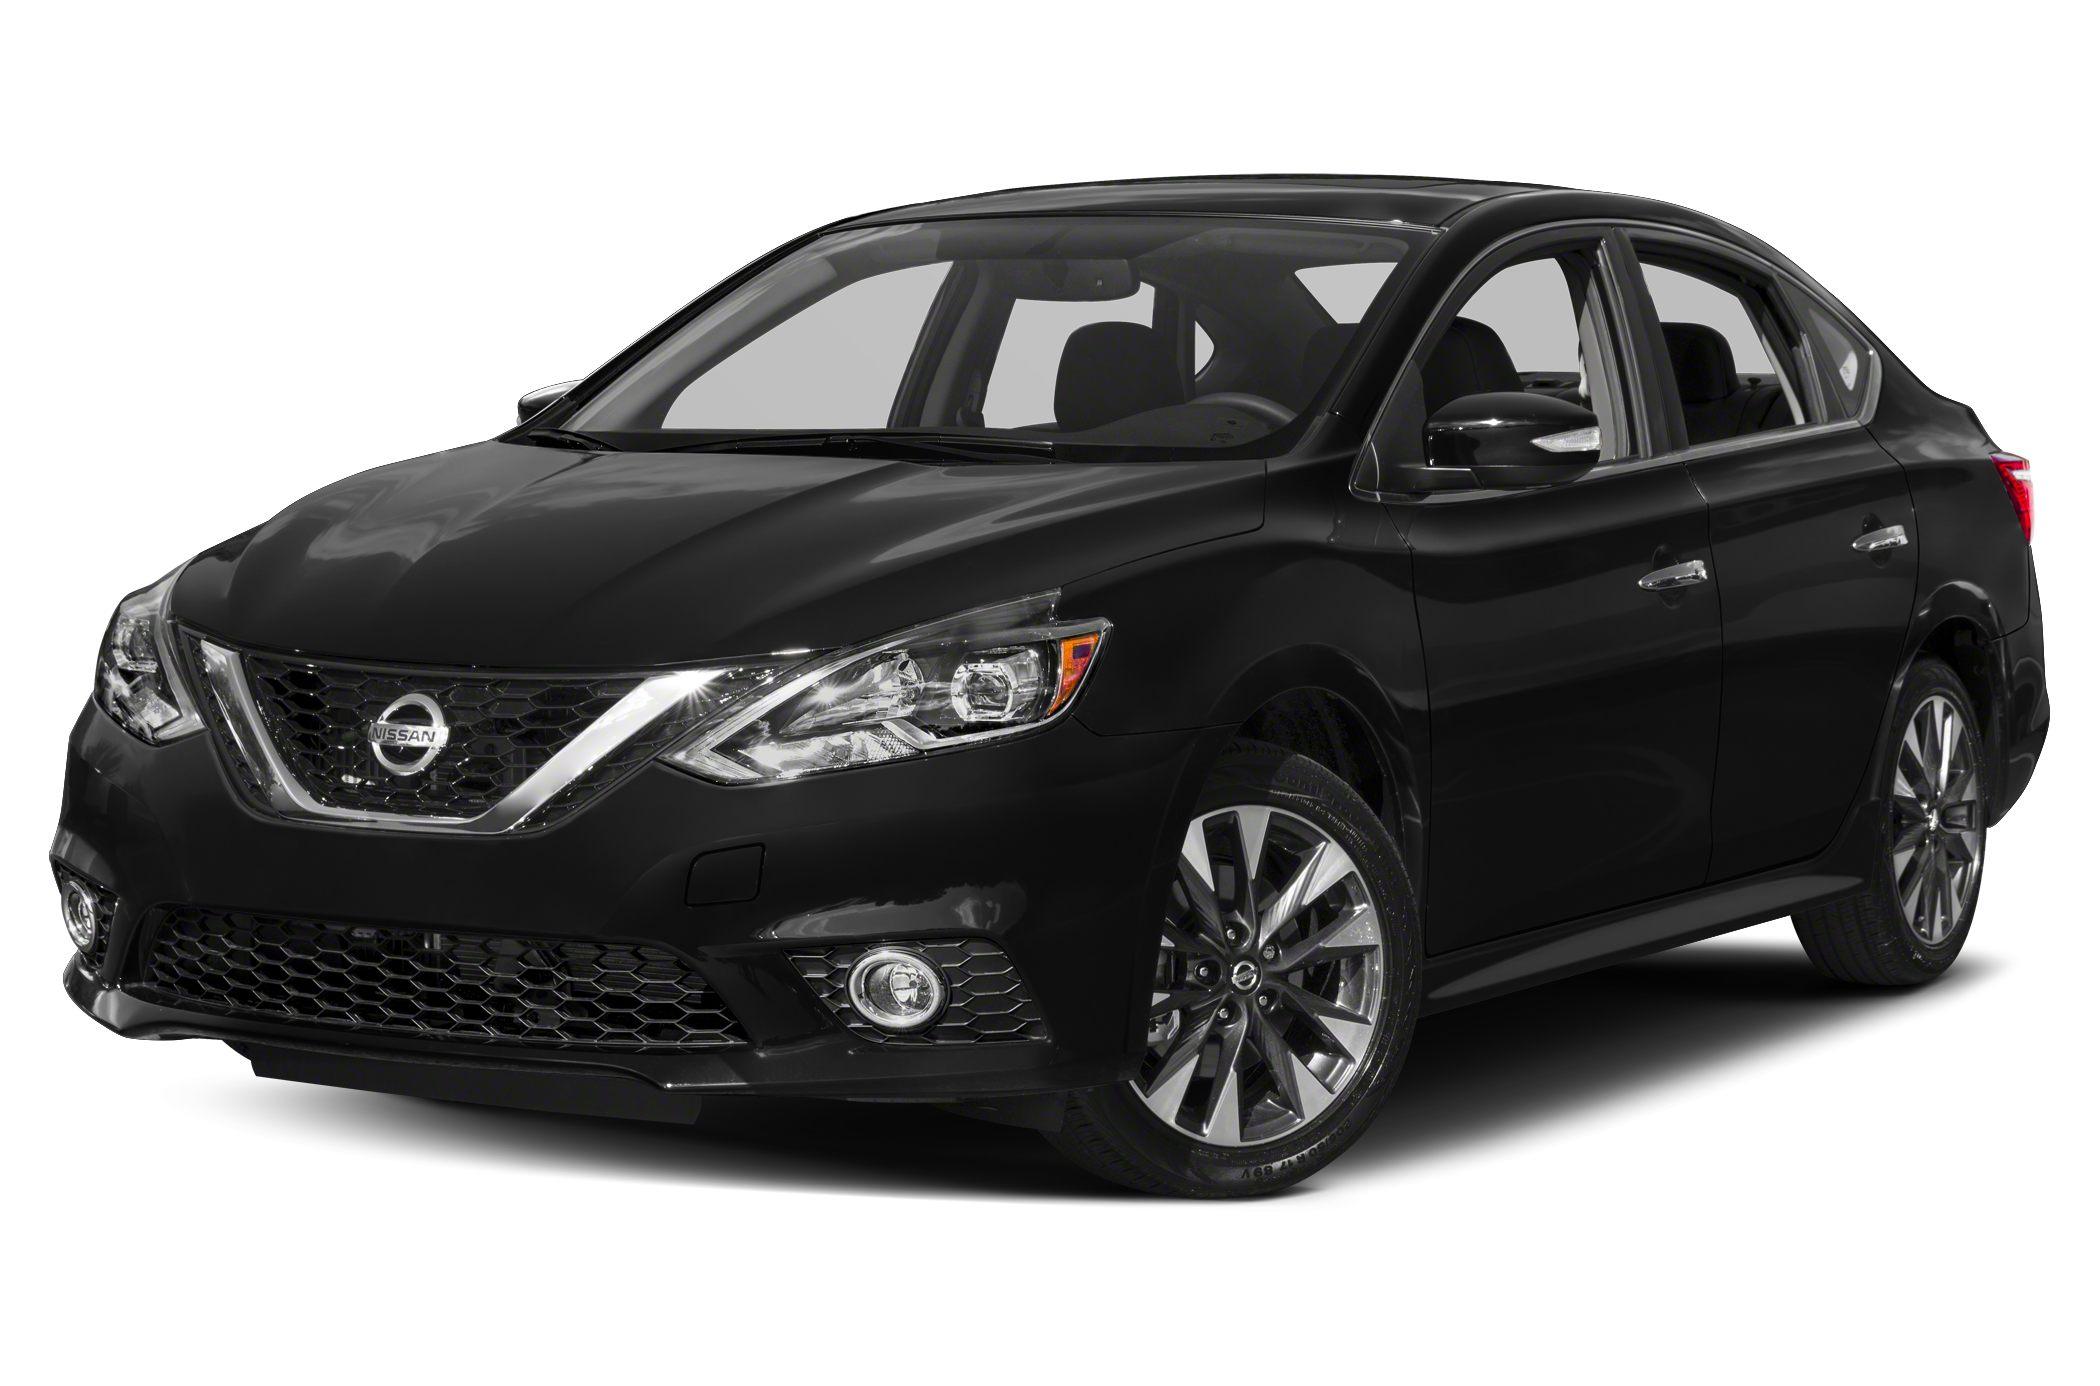 2017 Nissan Sentra Sr Turbo 4dr Sedan Specs And Prices